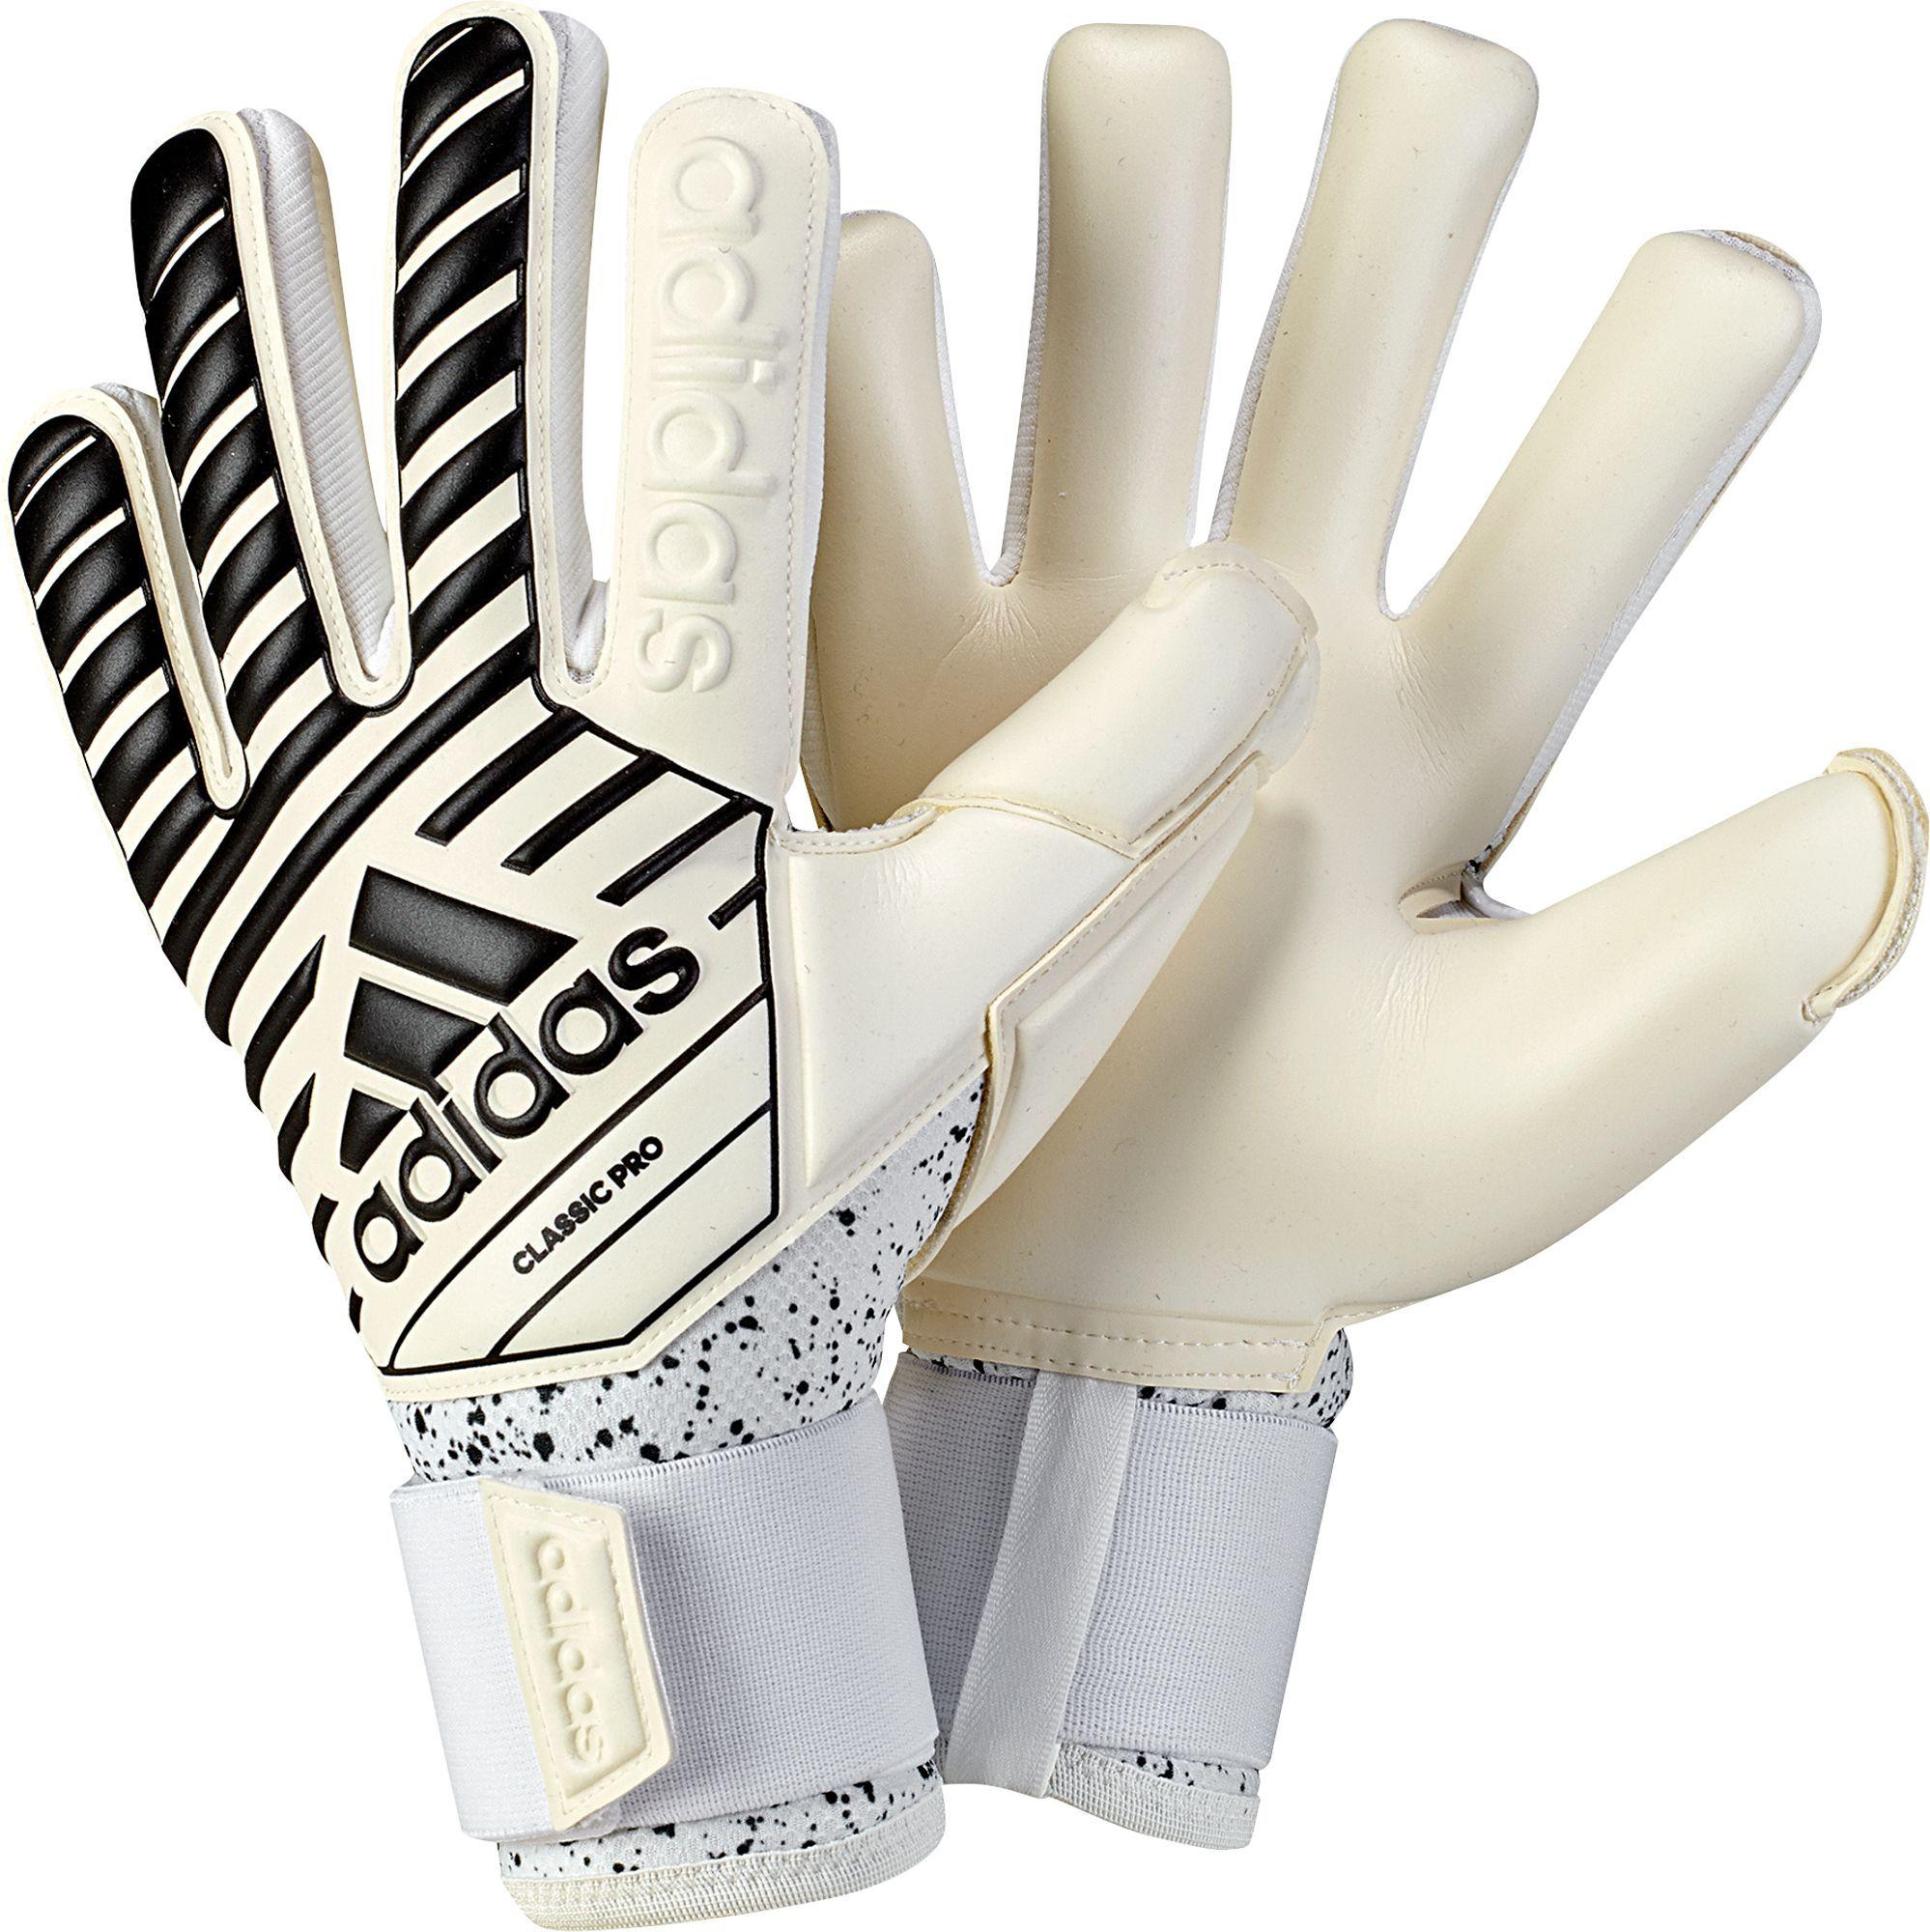 Adidas Adult Classic Pro Soccer Goalkeeper Gloves In 2020 Goalkeeper Gloves Goalkeeper Gloves